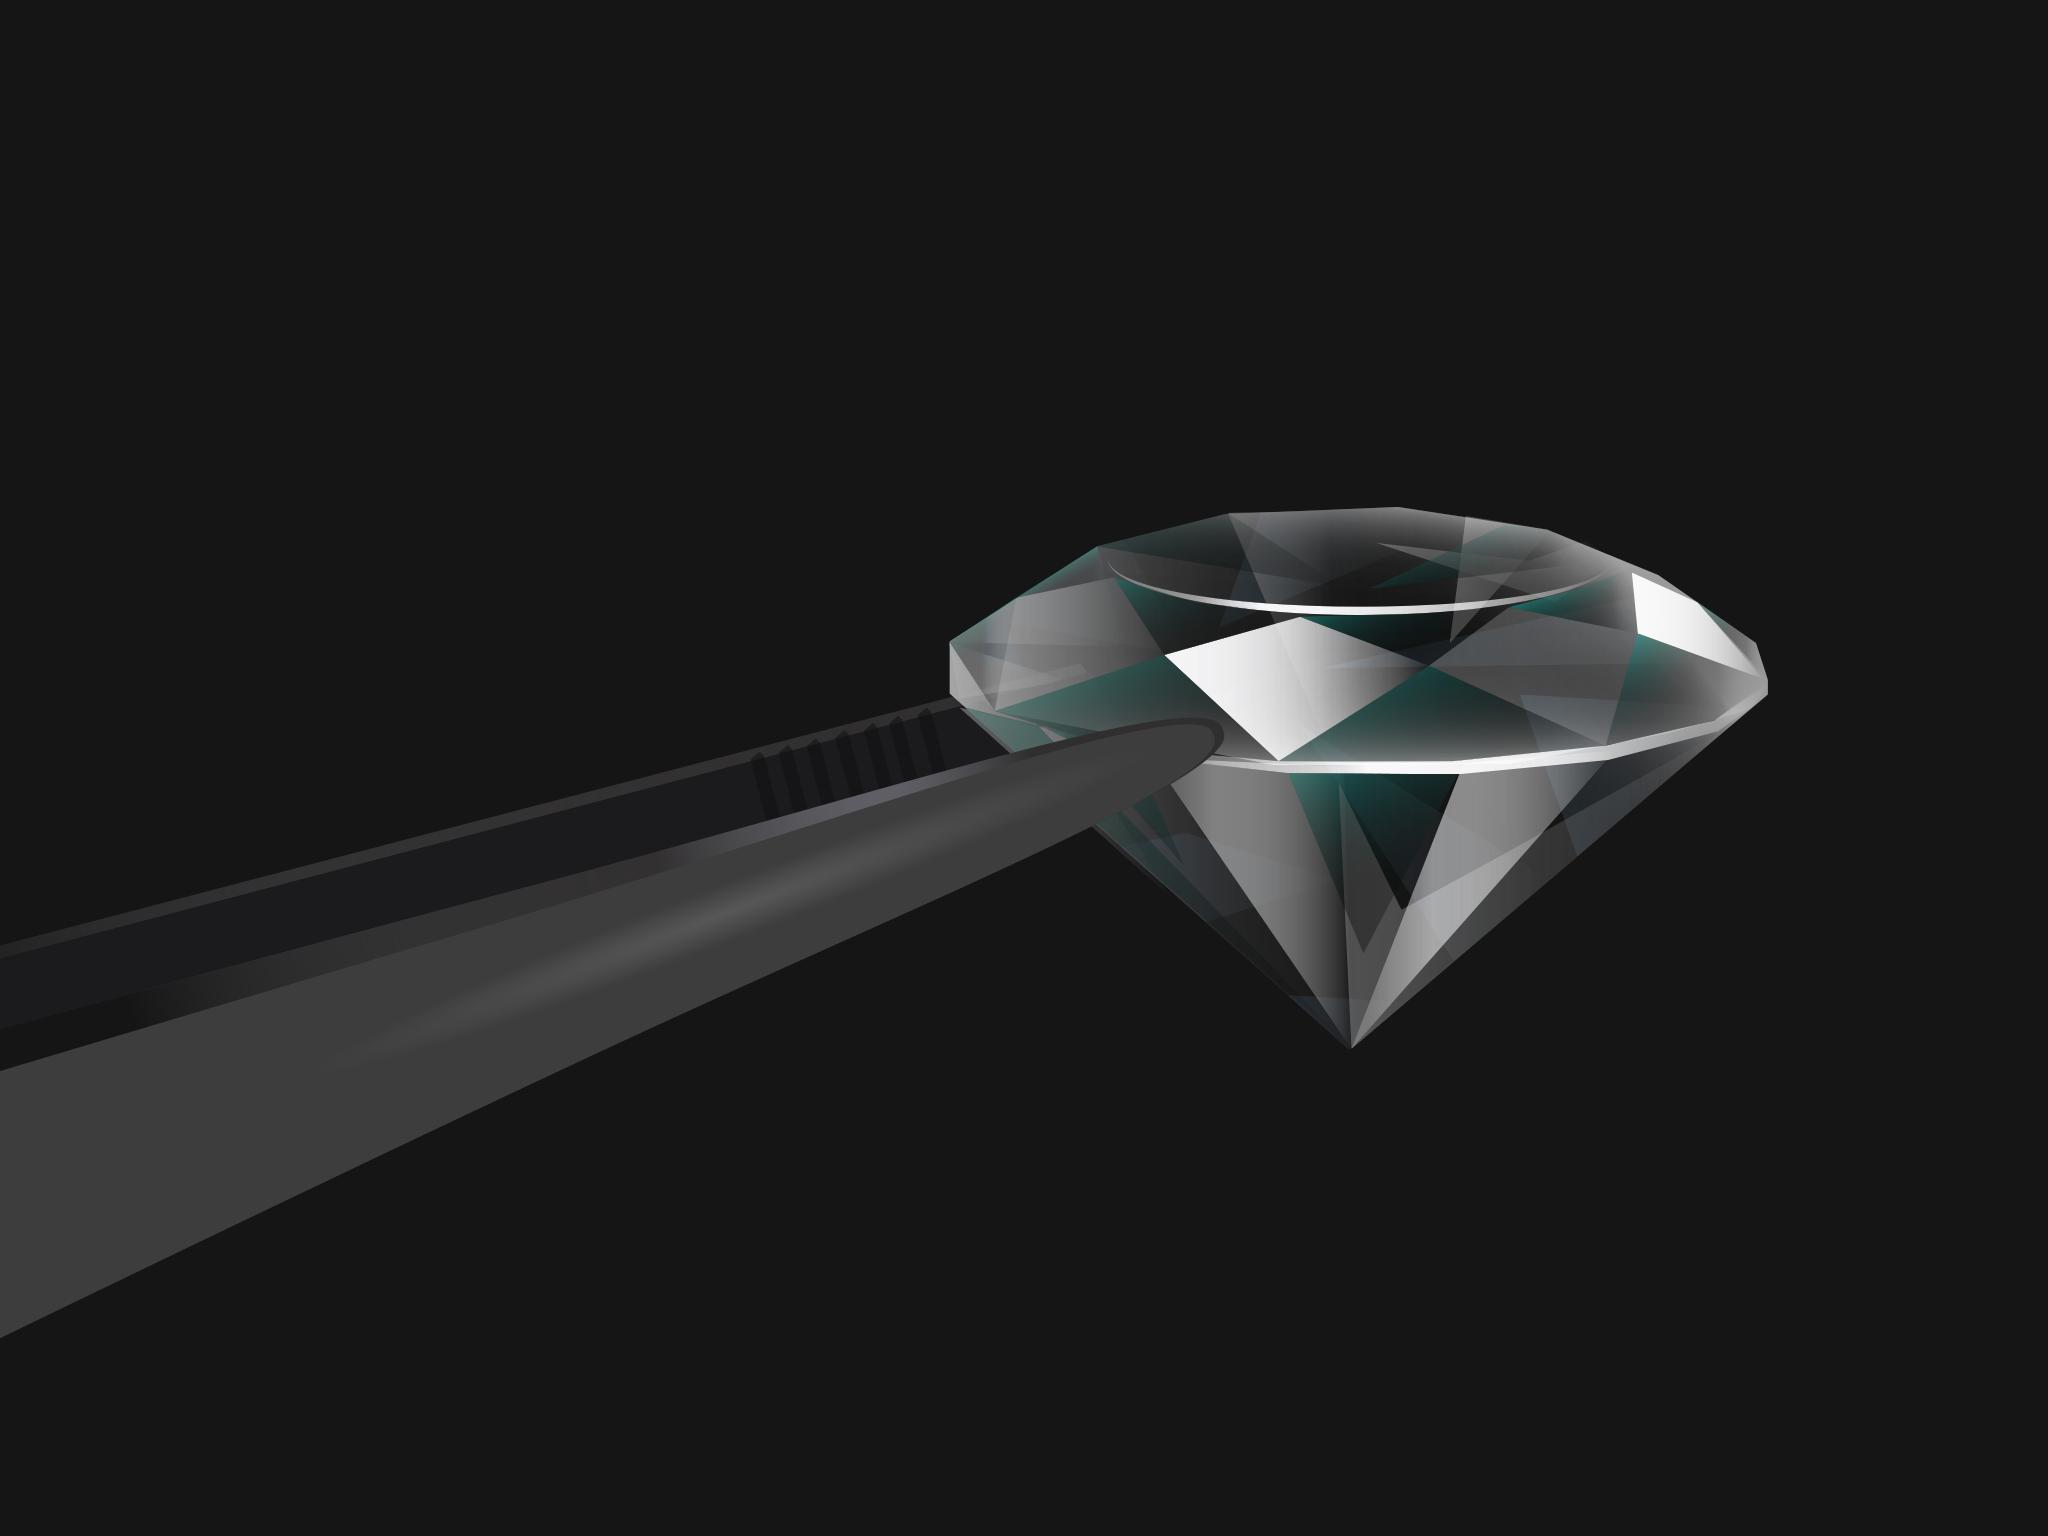 20210108_diamond_illustration_2048x1536px